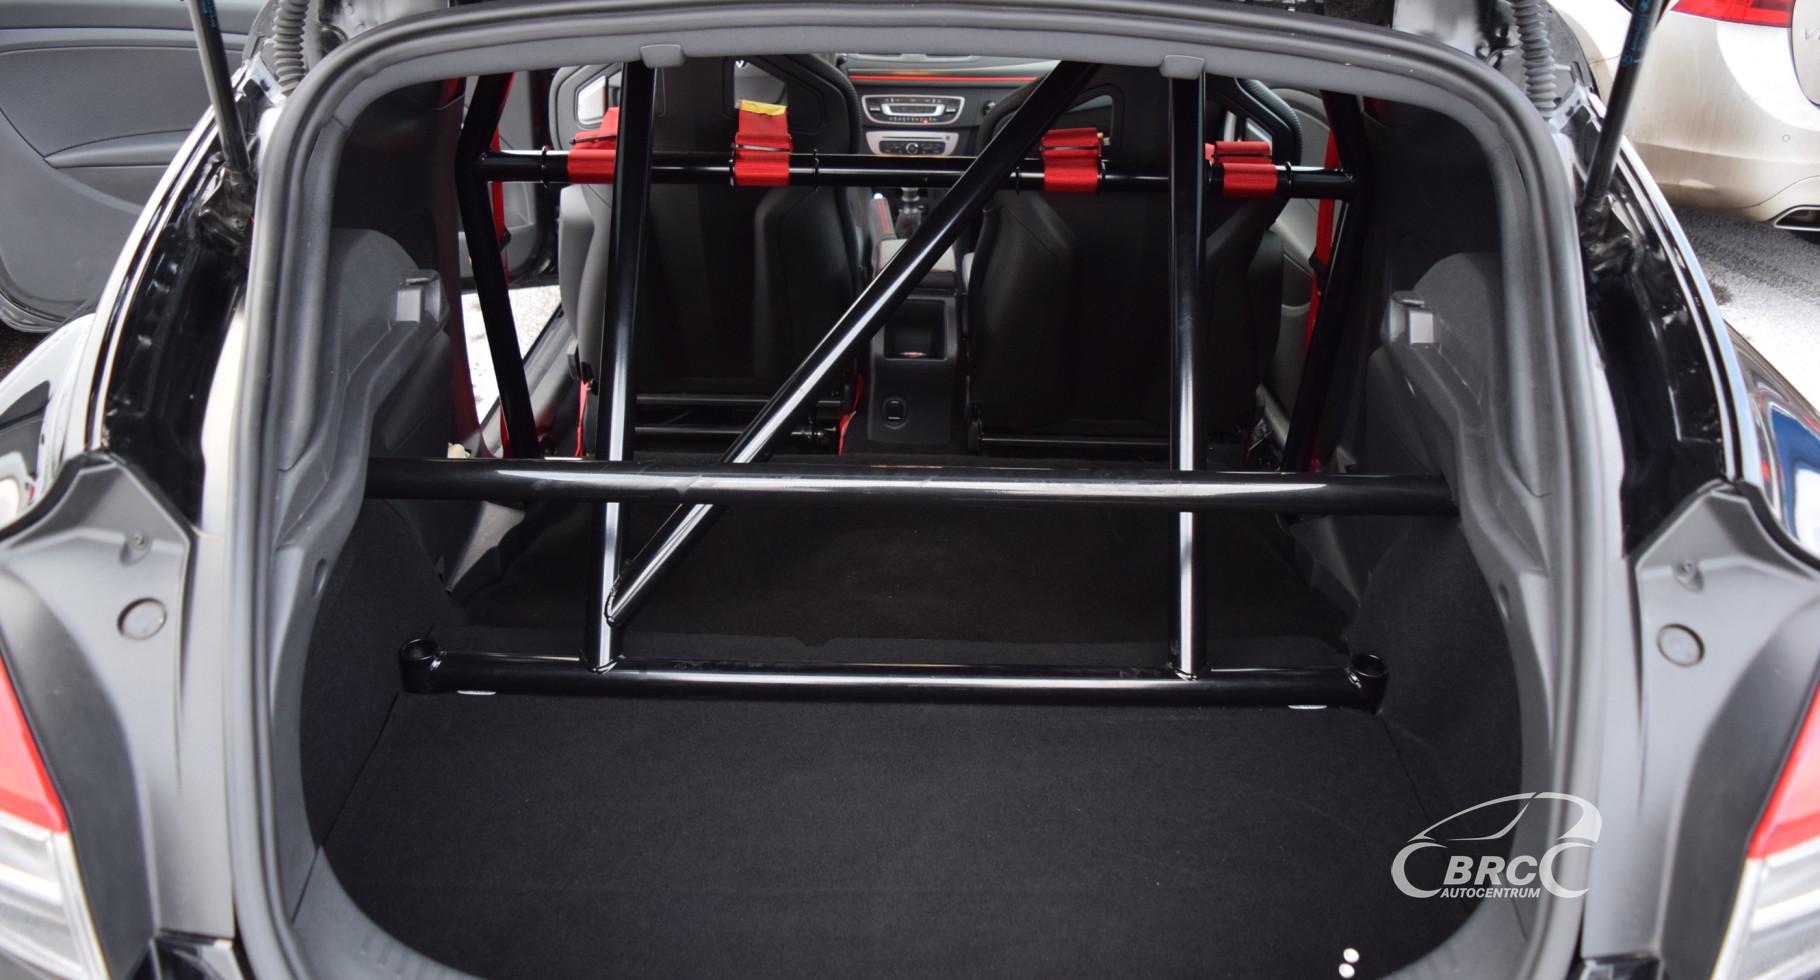 Renault Megane RS Trophy Ringtoy KW, Kirfel, Endless